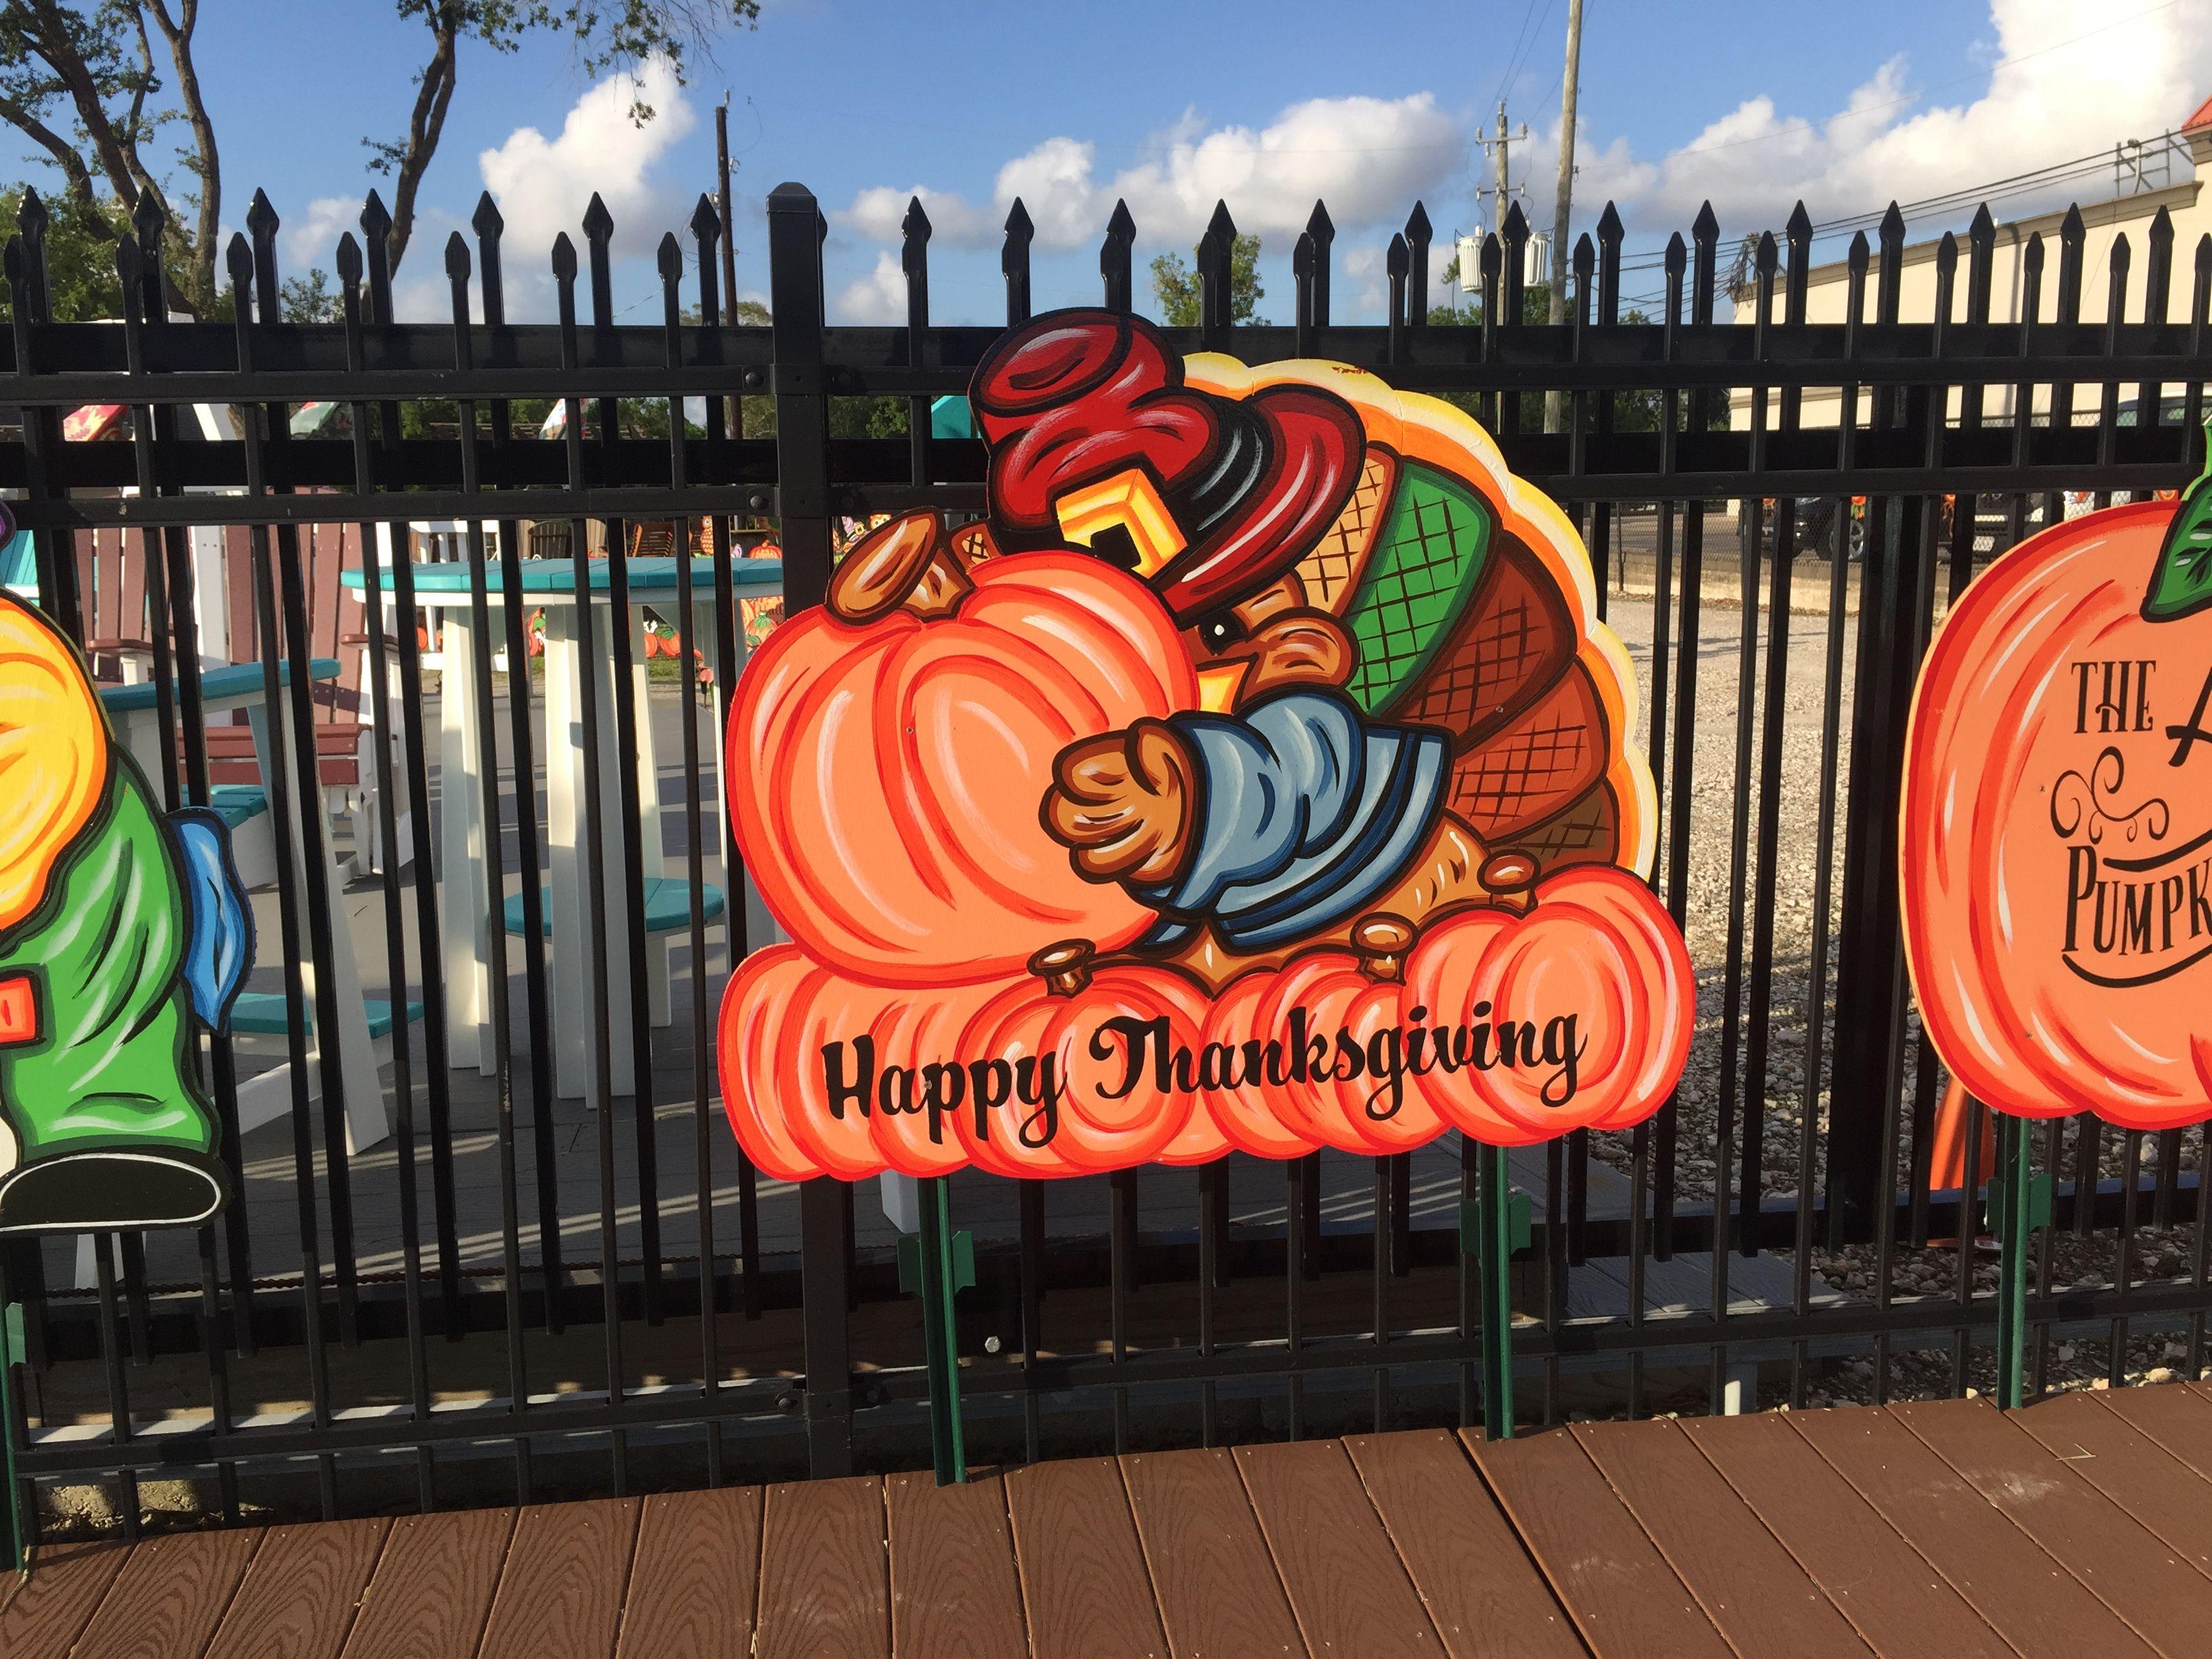 Thanksgiving 2020 Yard Decor Ideas Created By Yardartrus Com In 2020 Yard Art Outdoor Thanksgiving Yard Decor